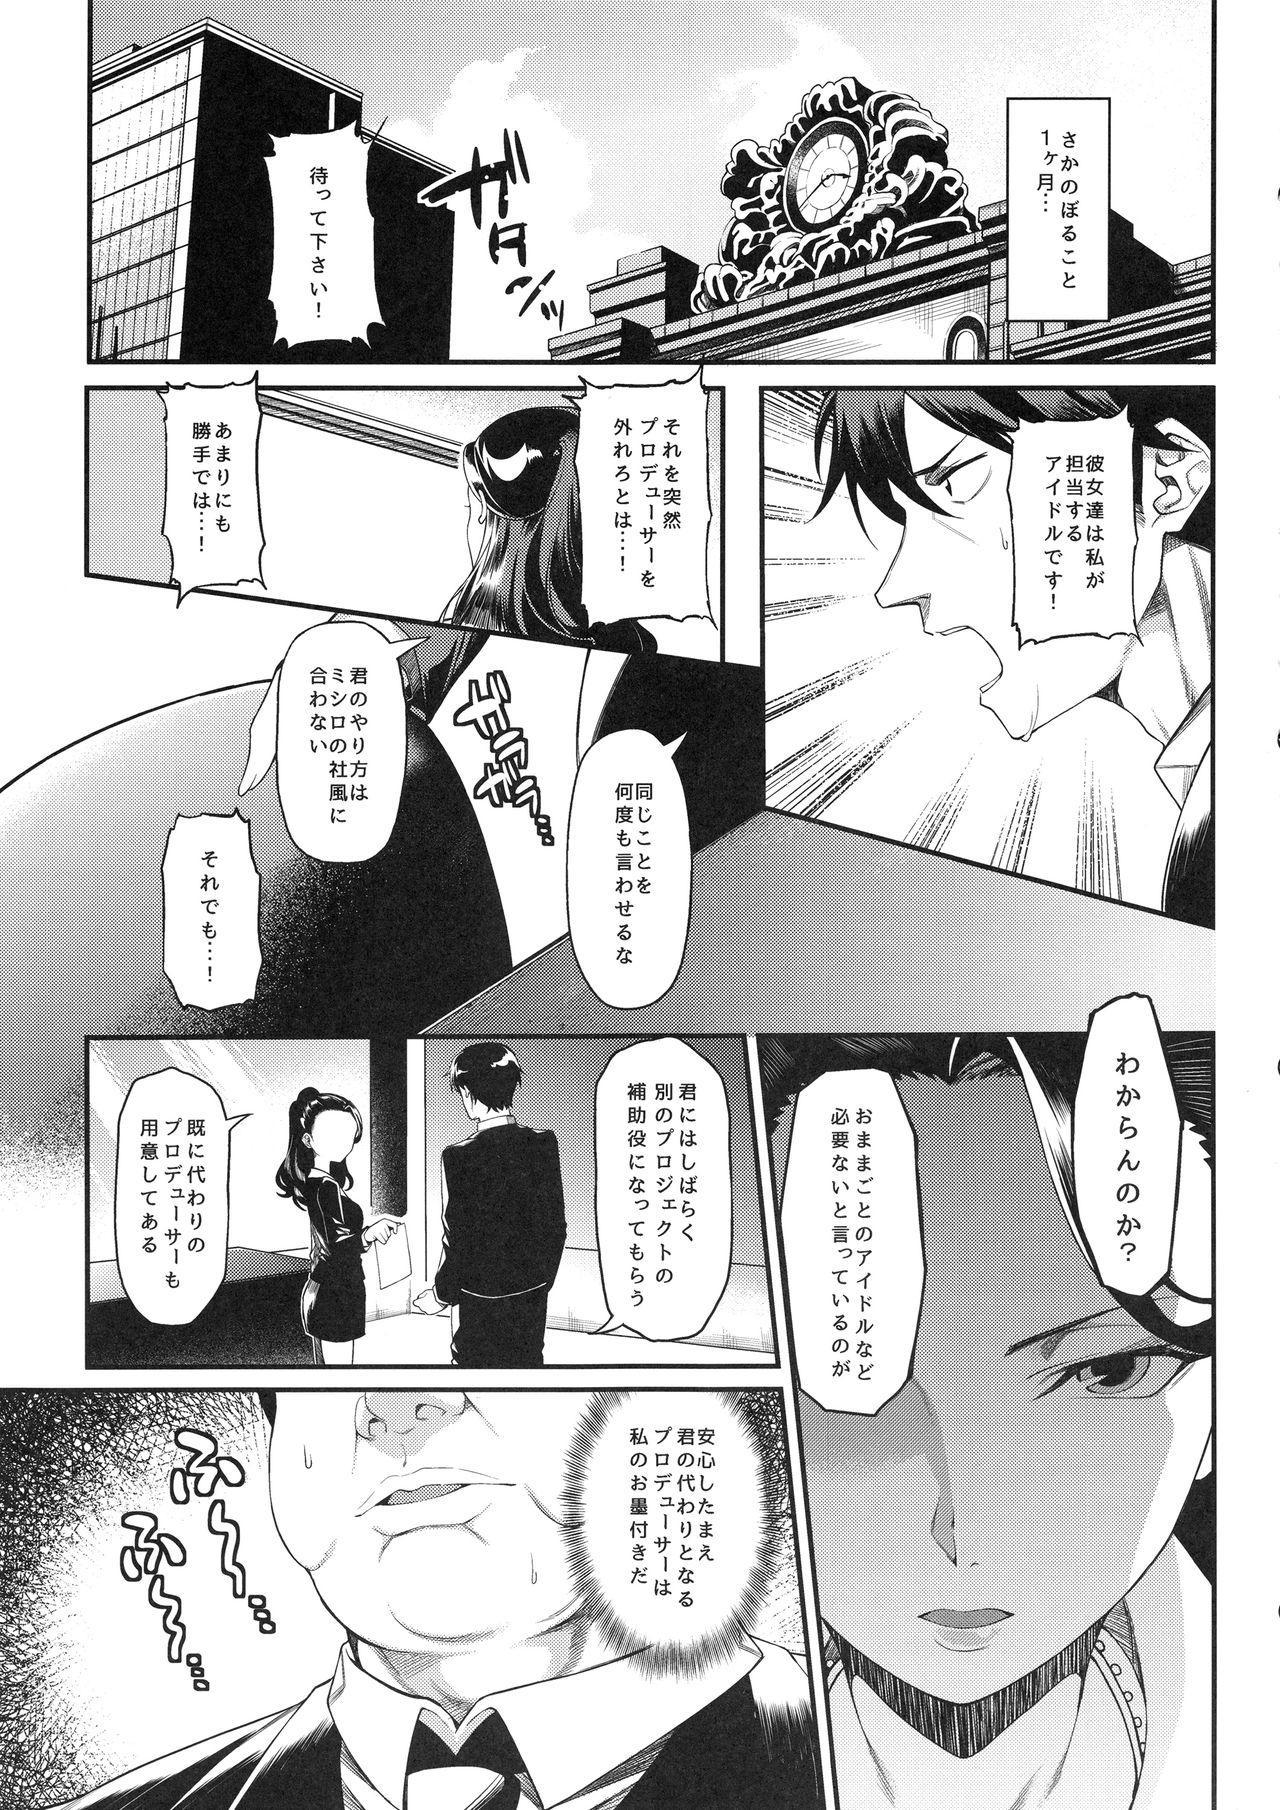 Miria-chan to Kojin Lesson 5